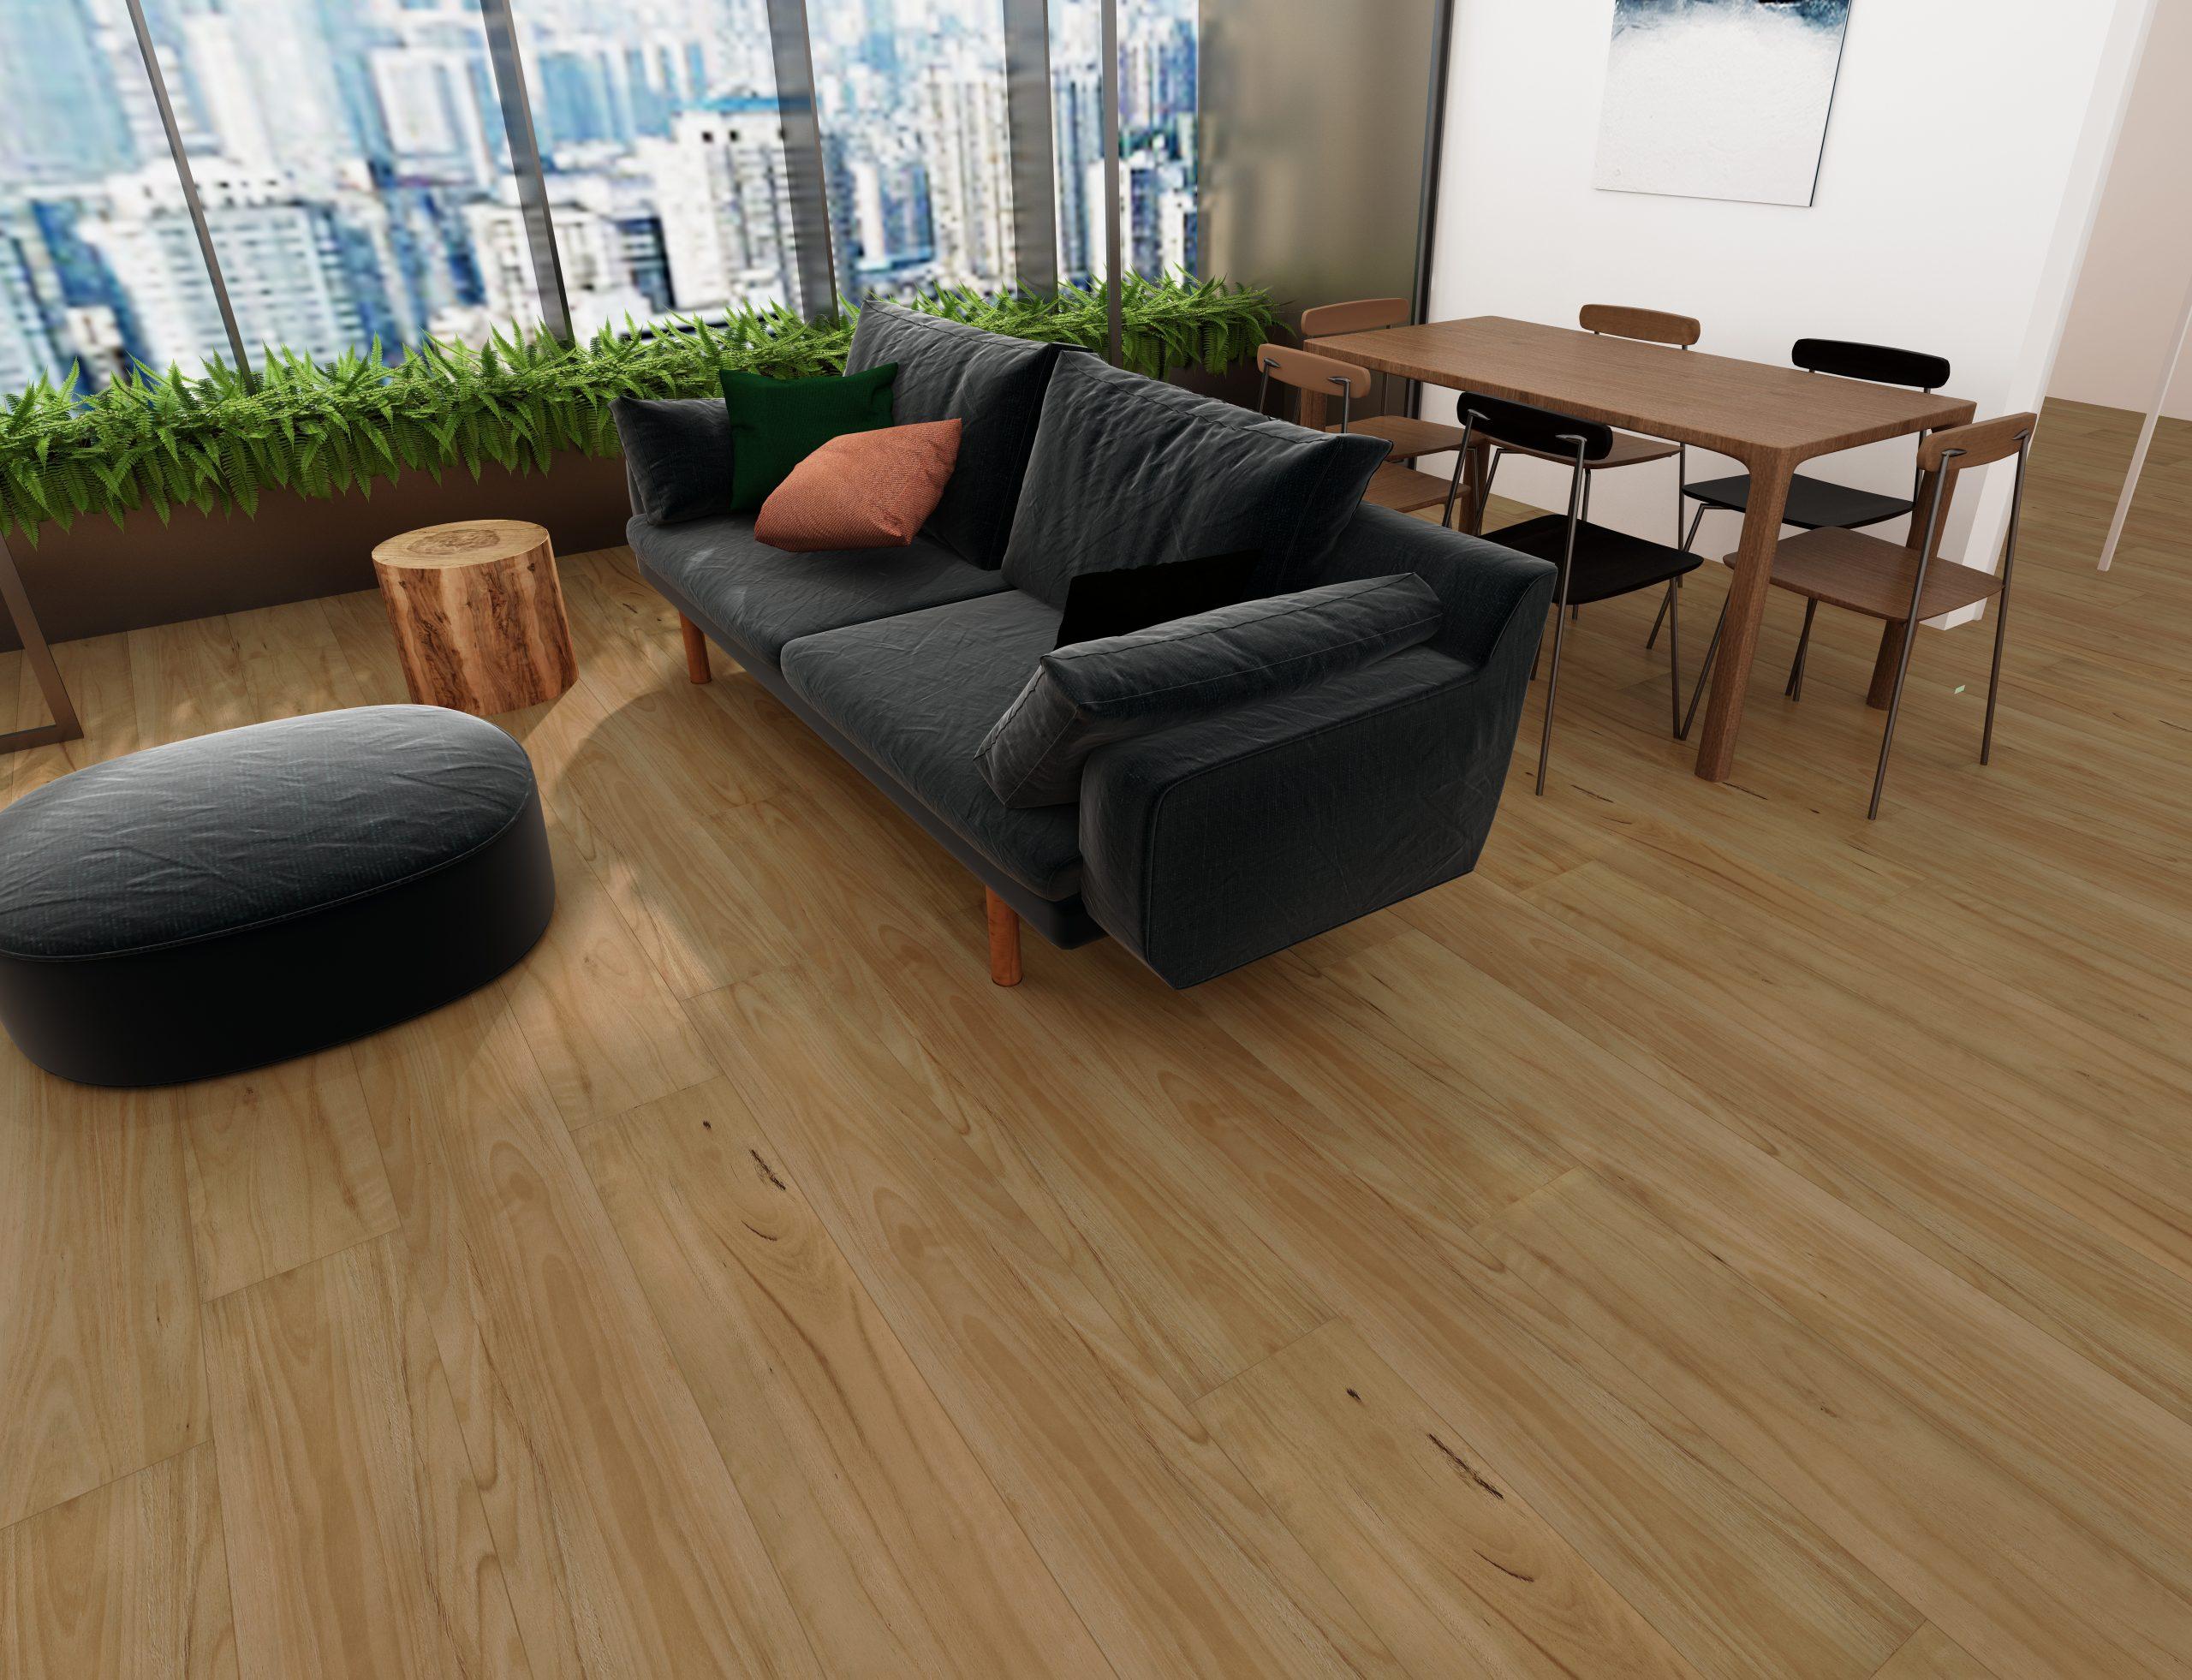 Kallia Hydro Xl Carpet Connect, Charisma Plus Laminate Flooring